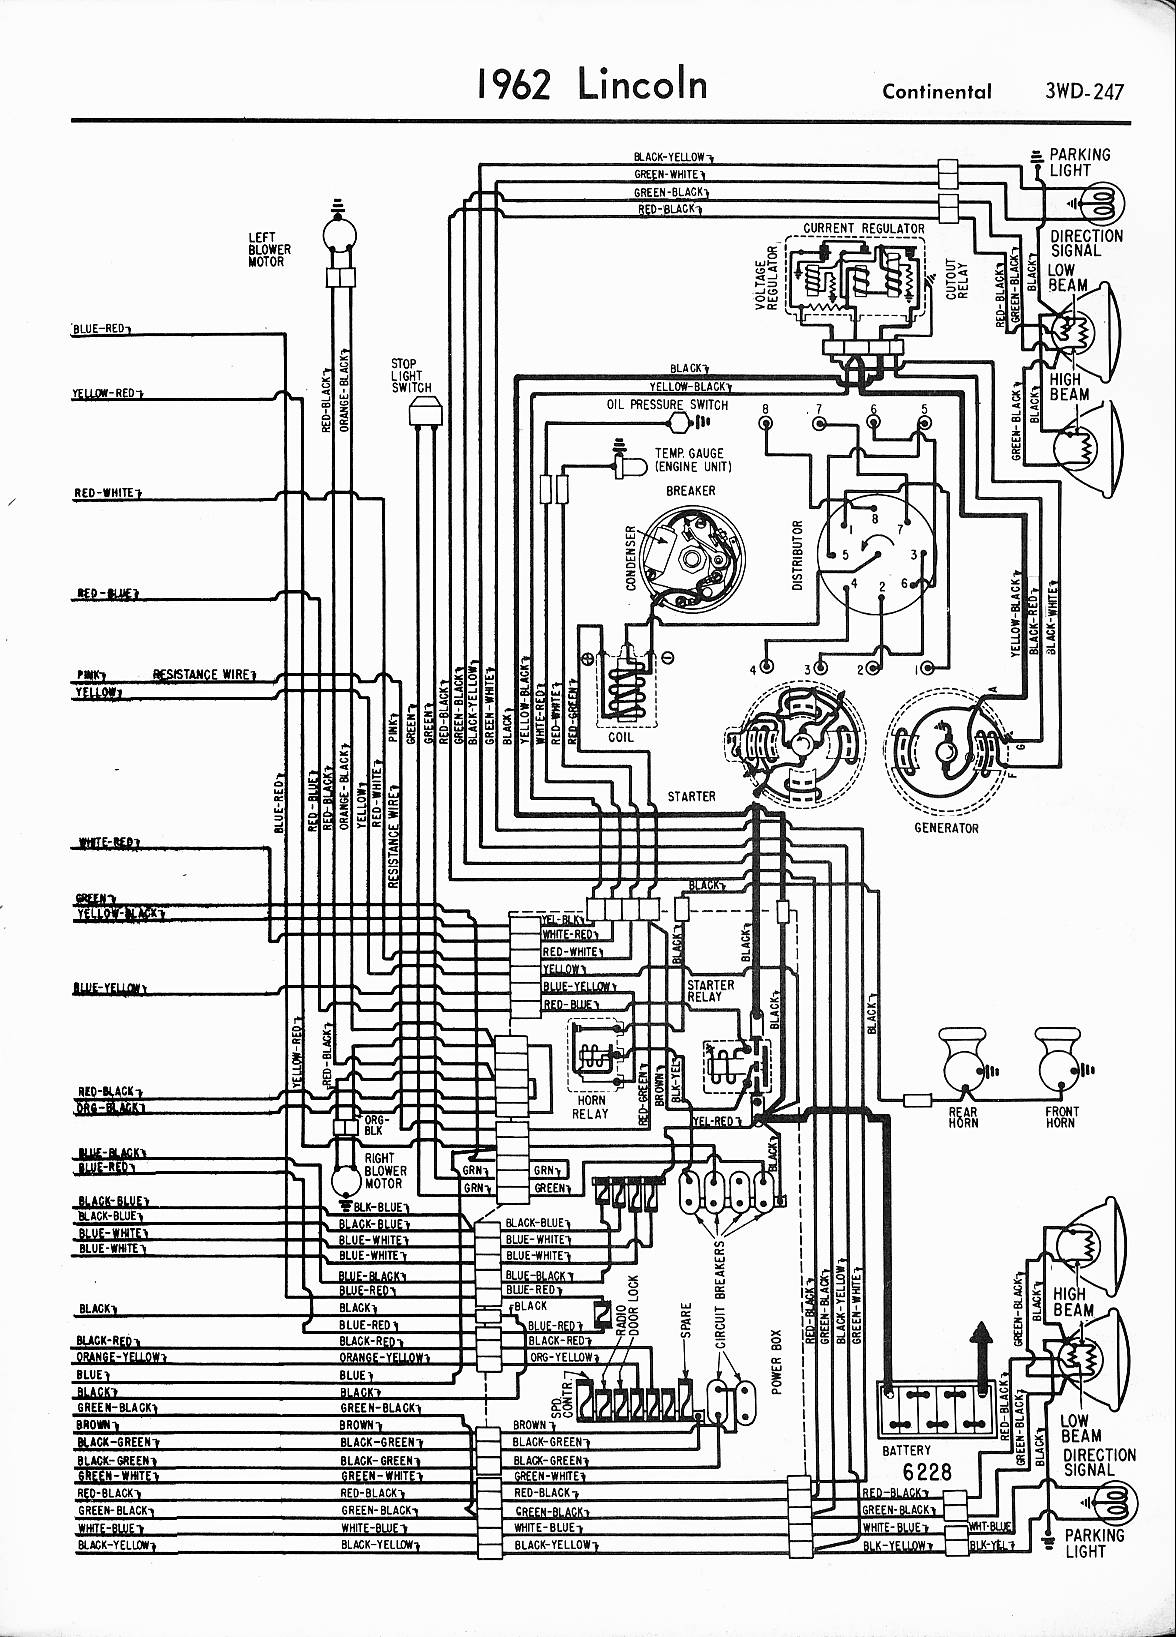 2002 mustang headlight wiring diagram lighting 2 way switching lincoln diagrams 1957 1965 1962 left half